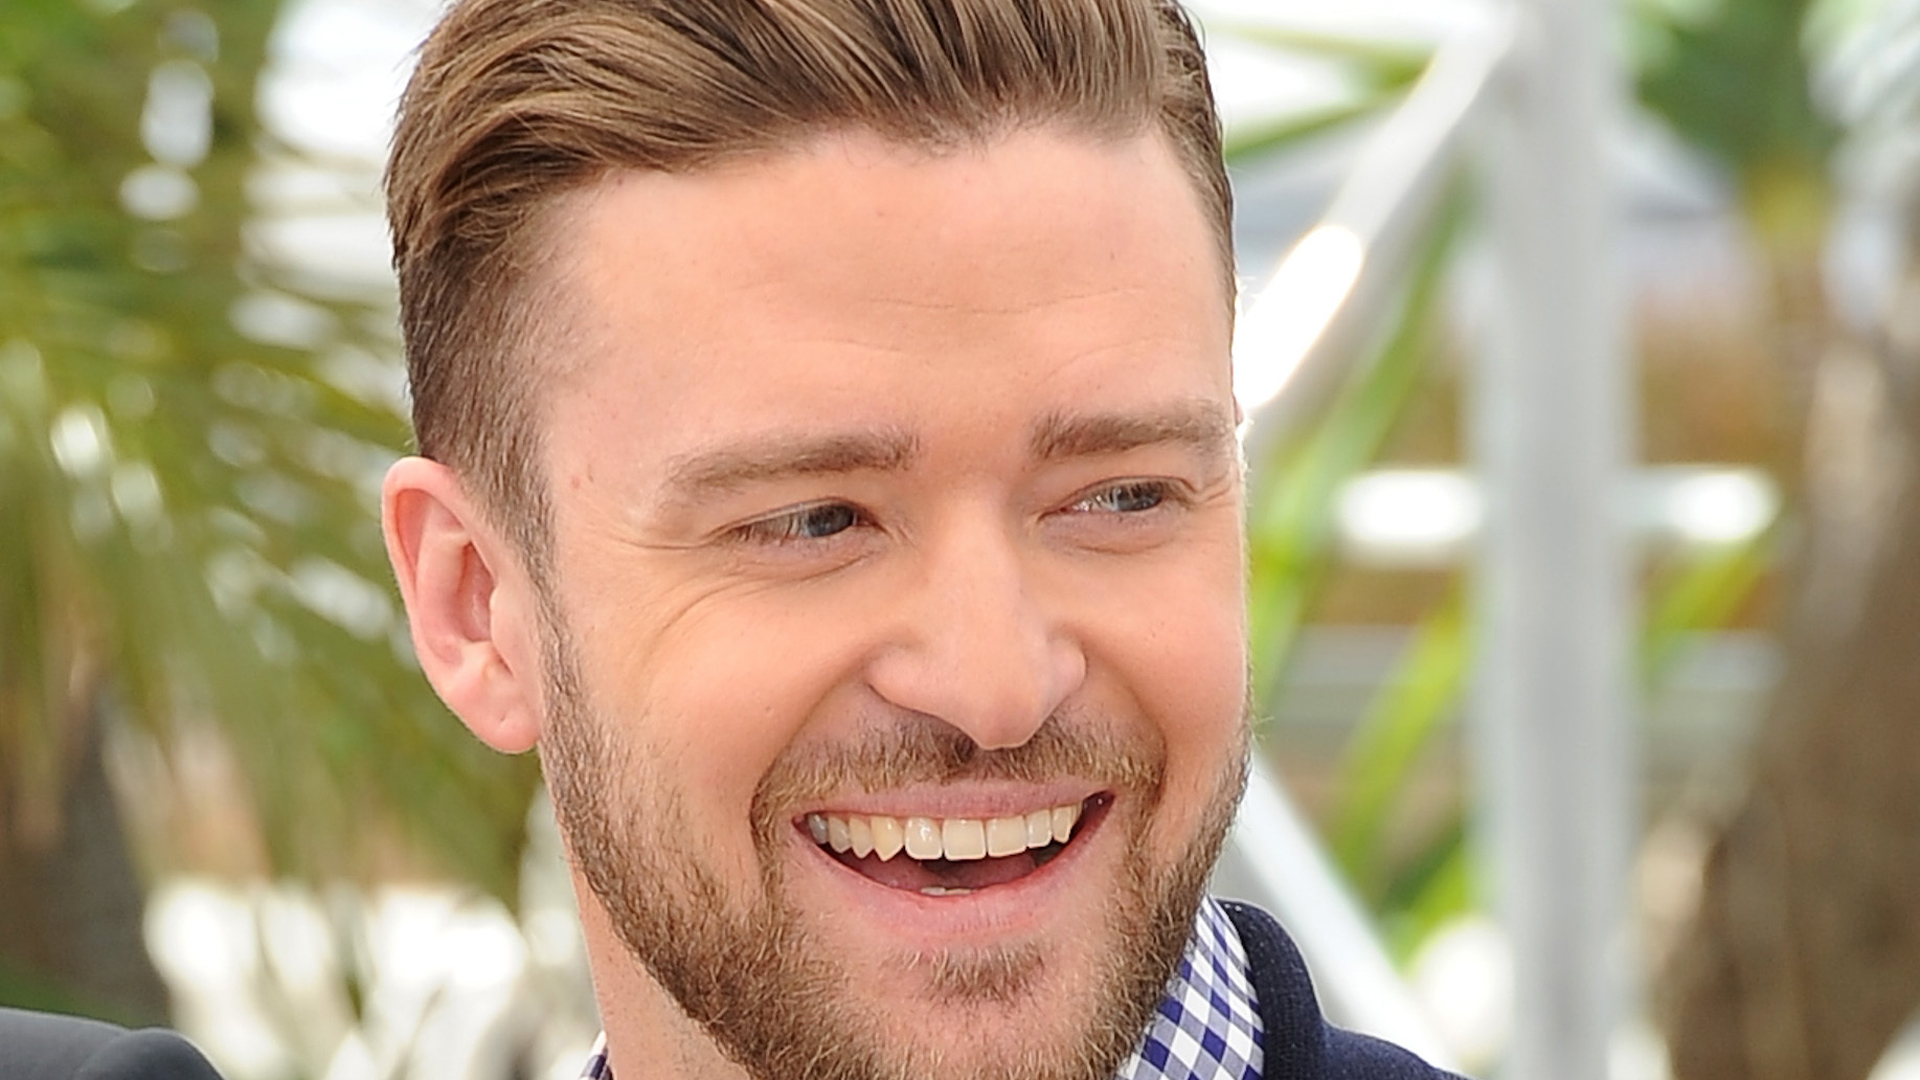 Justin Timberlake Background